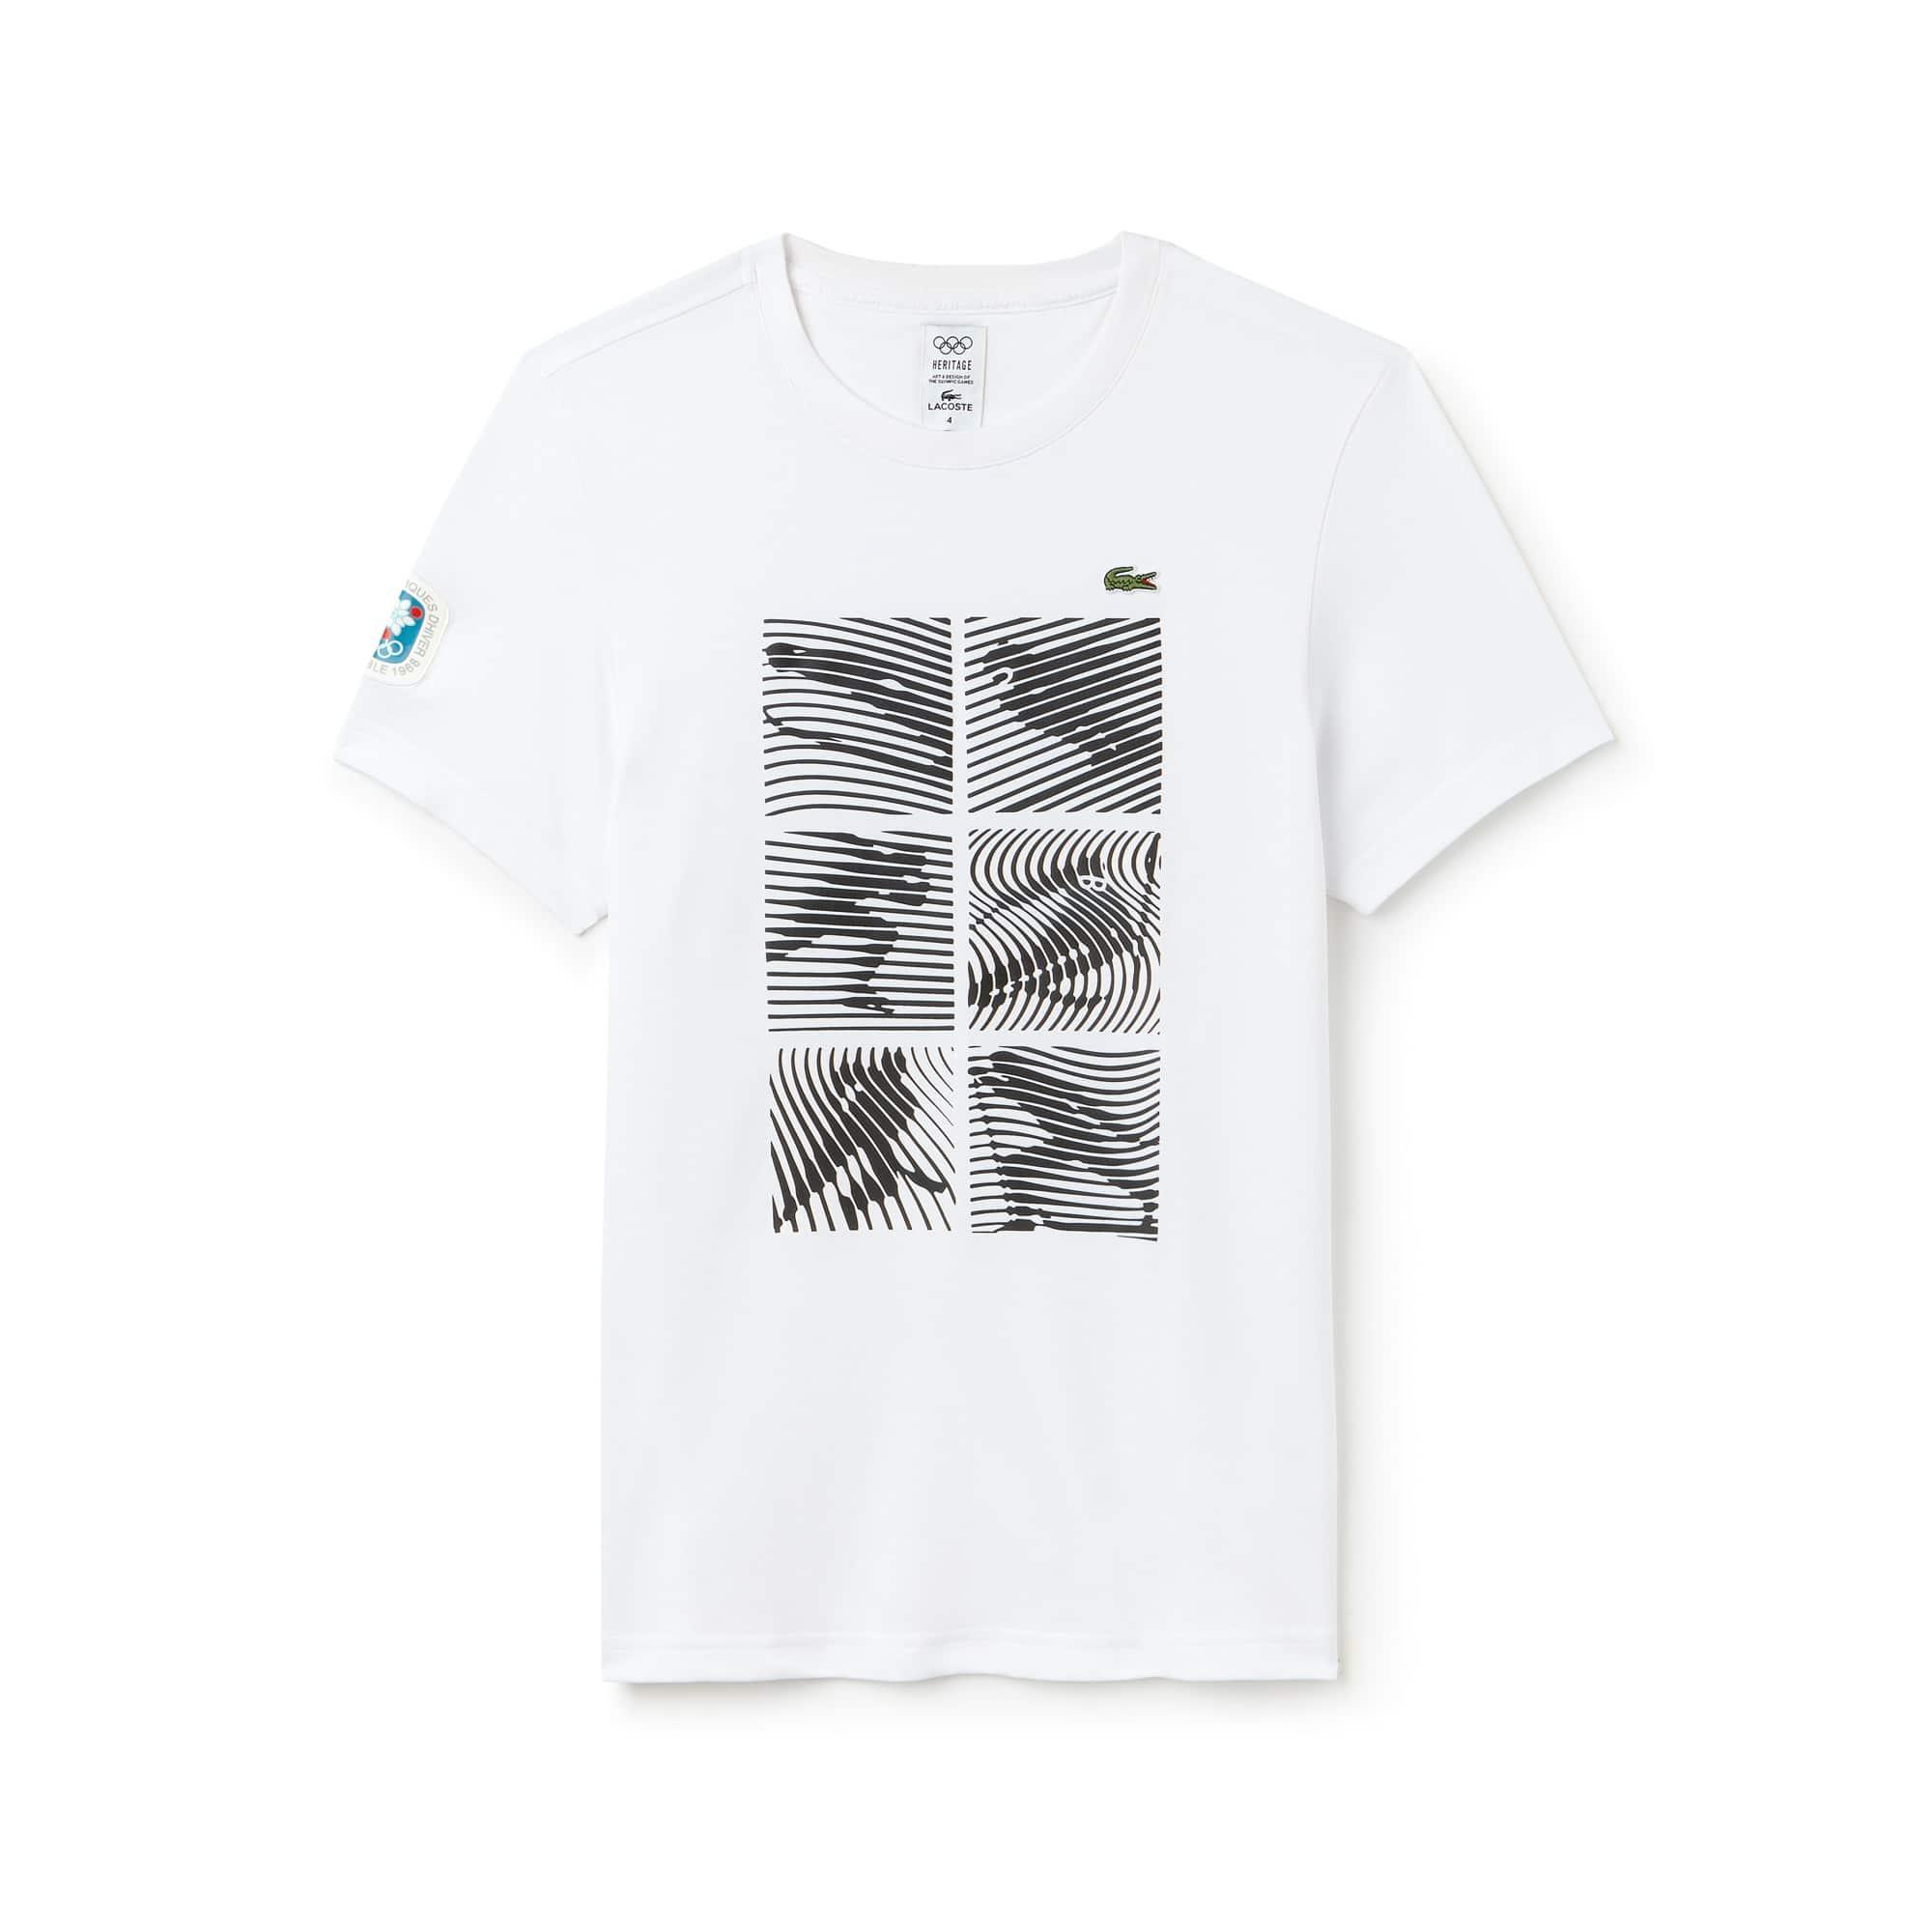 Lacoste SPORT系列奥运纪念版男士科技平纹针织面料T恤